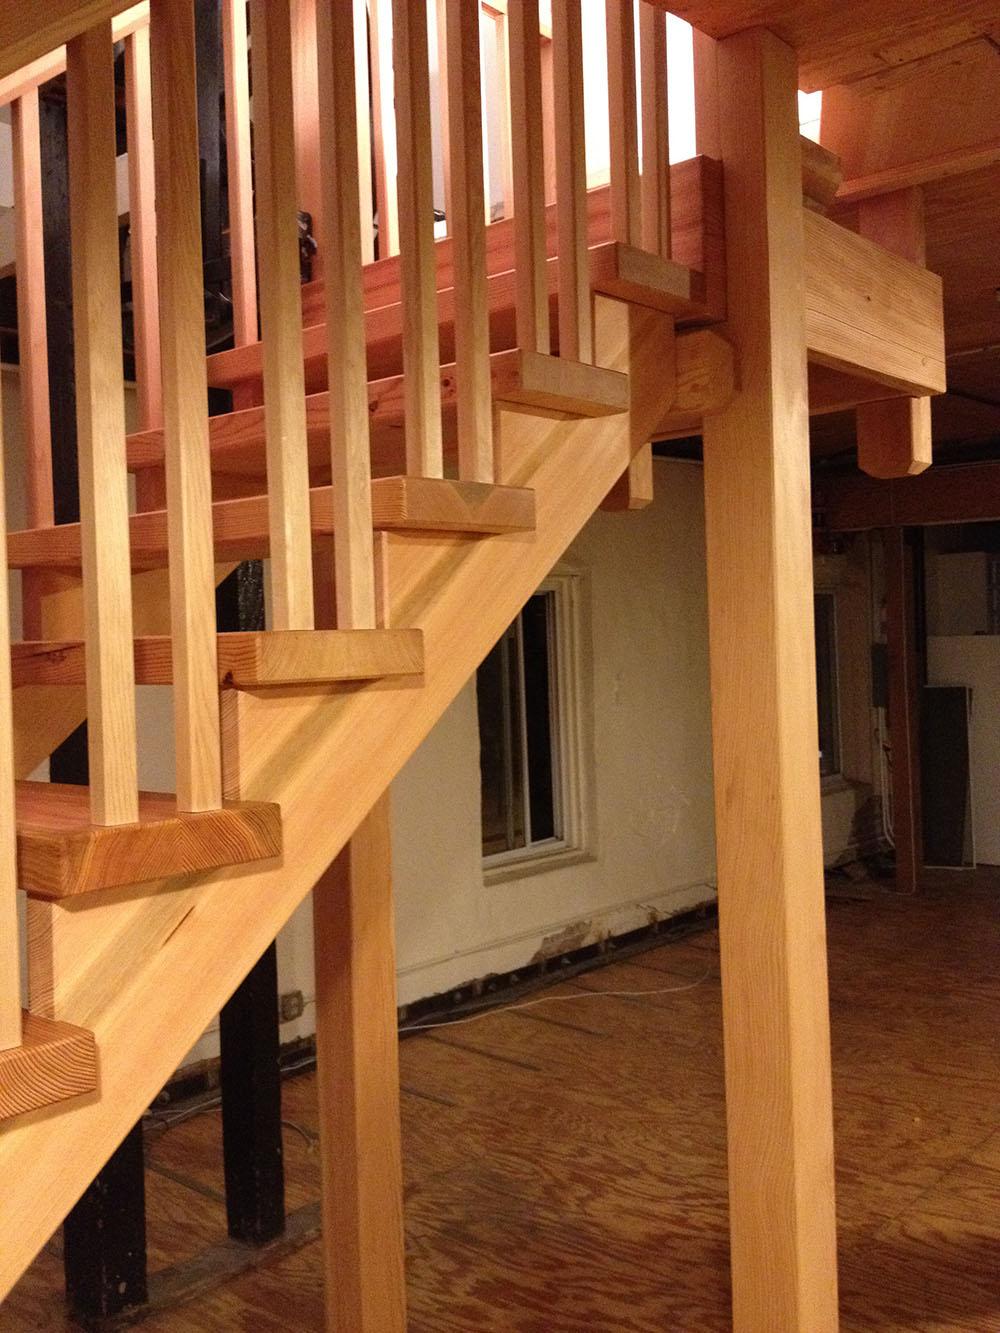 Bryant-St.-Stairs-Kevin-P-Clarke0011.jpg